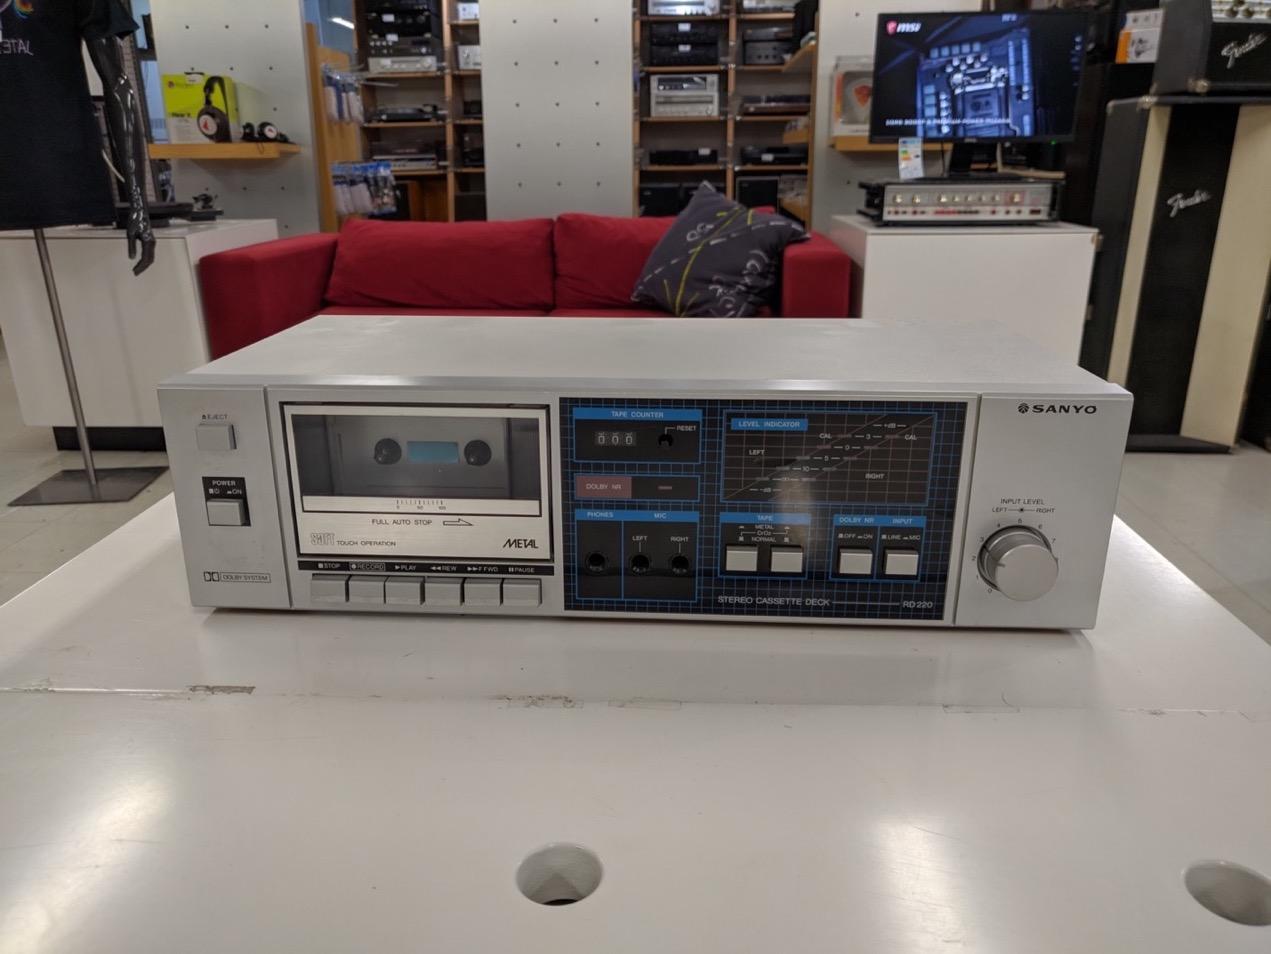 Sanyo RD-220 kasettidekki